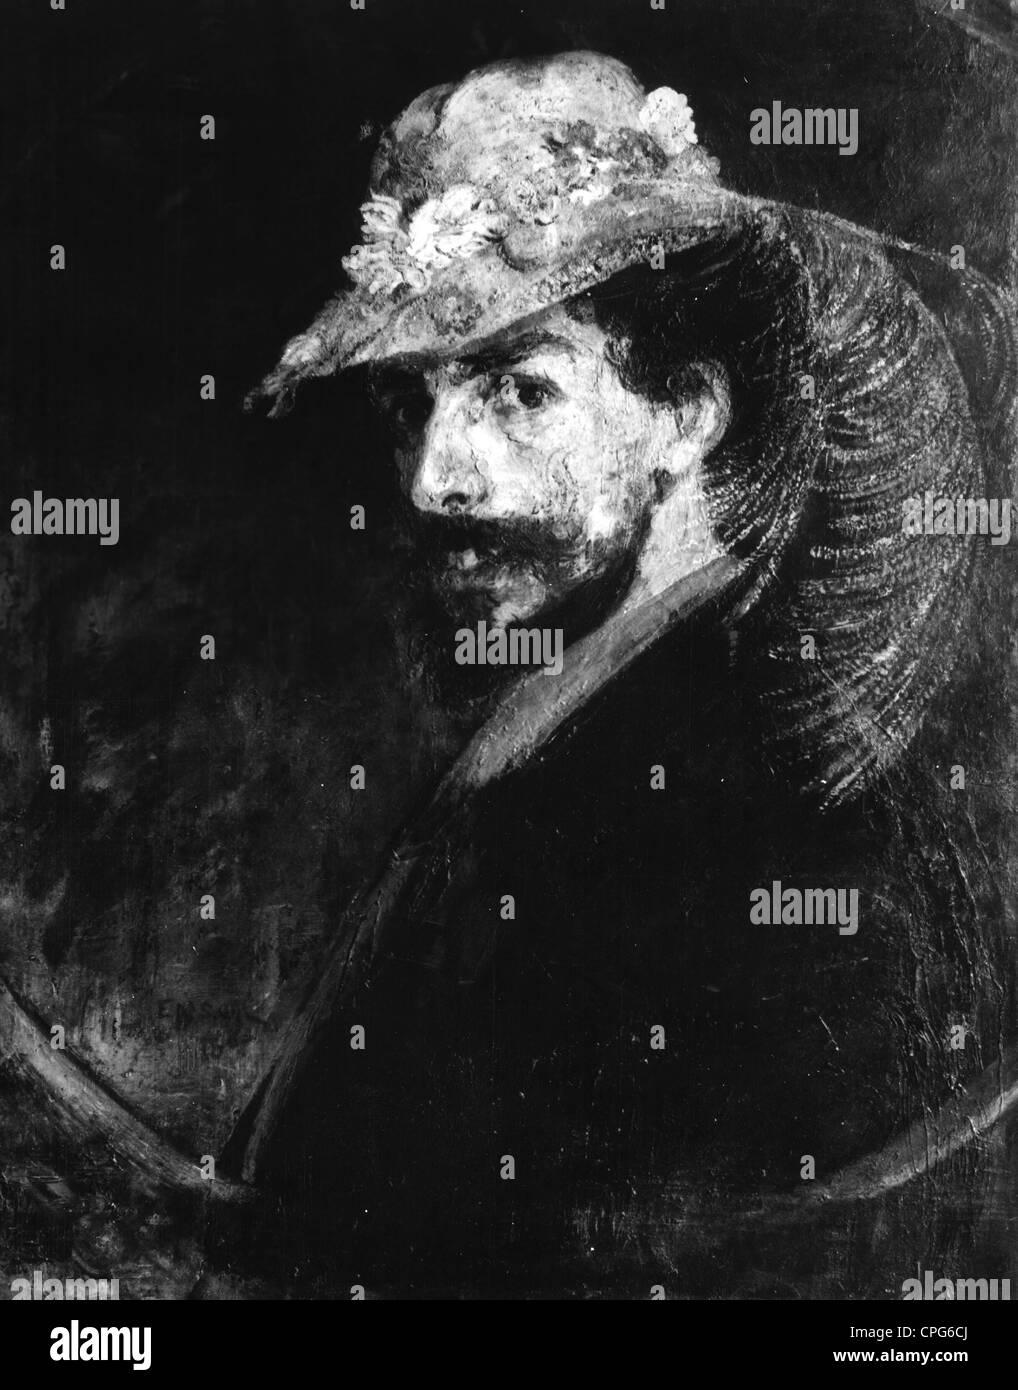 Ensor, James, 13.6.1860 - 19.111949, Belgian artist (painter, etcher), self-portrait, 1898, Additional-Rights-Clearances - Stock Image